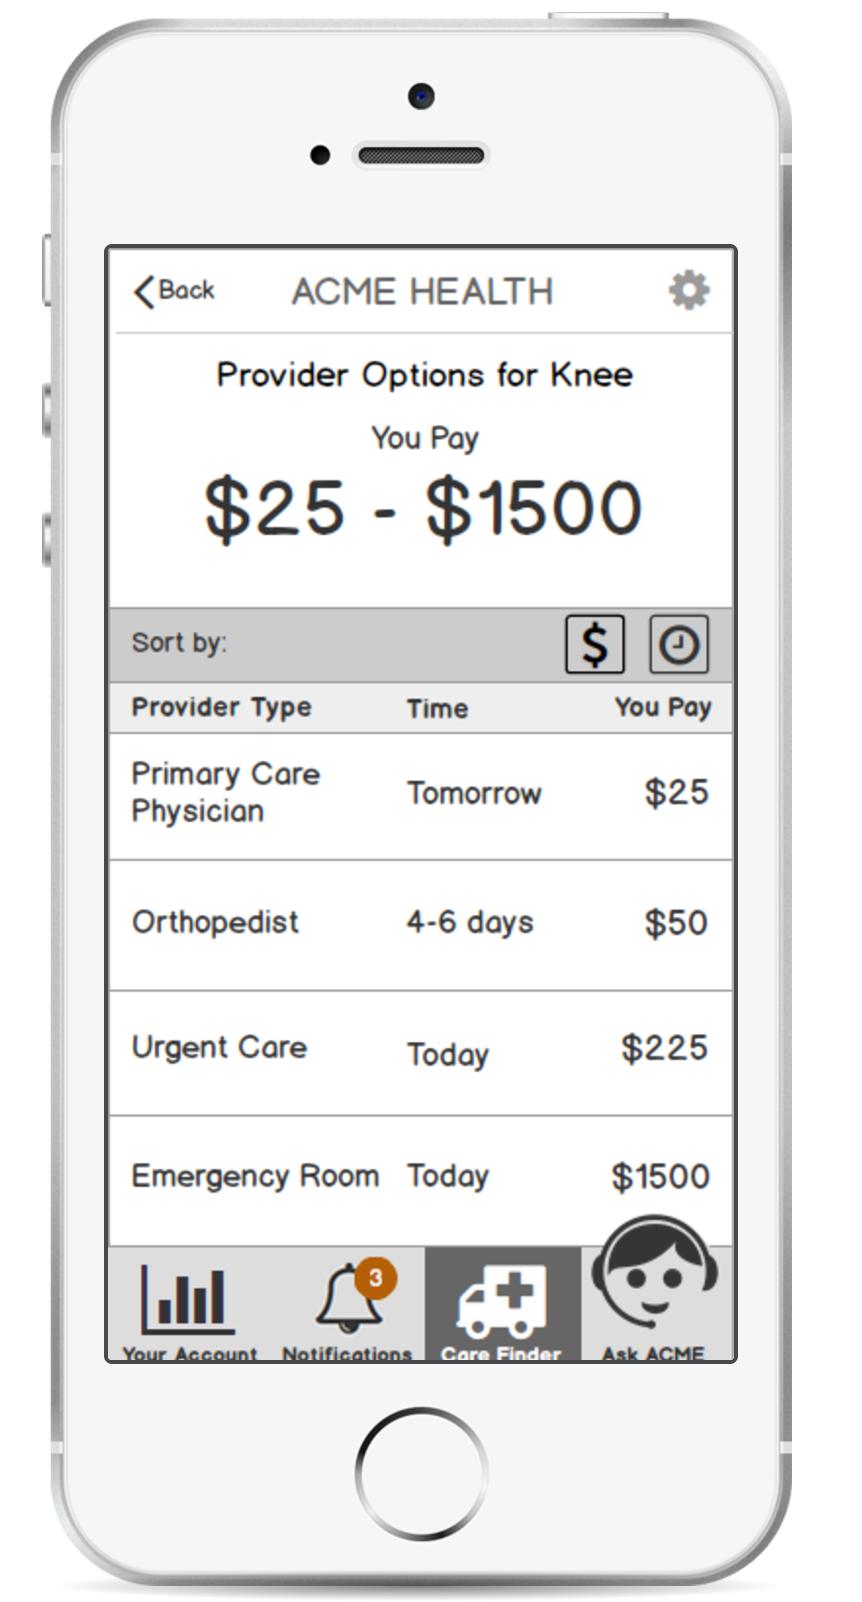 ACME Health: Care Finder